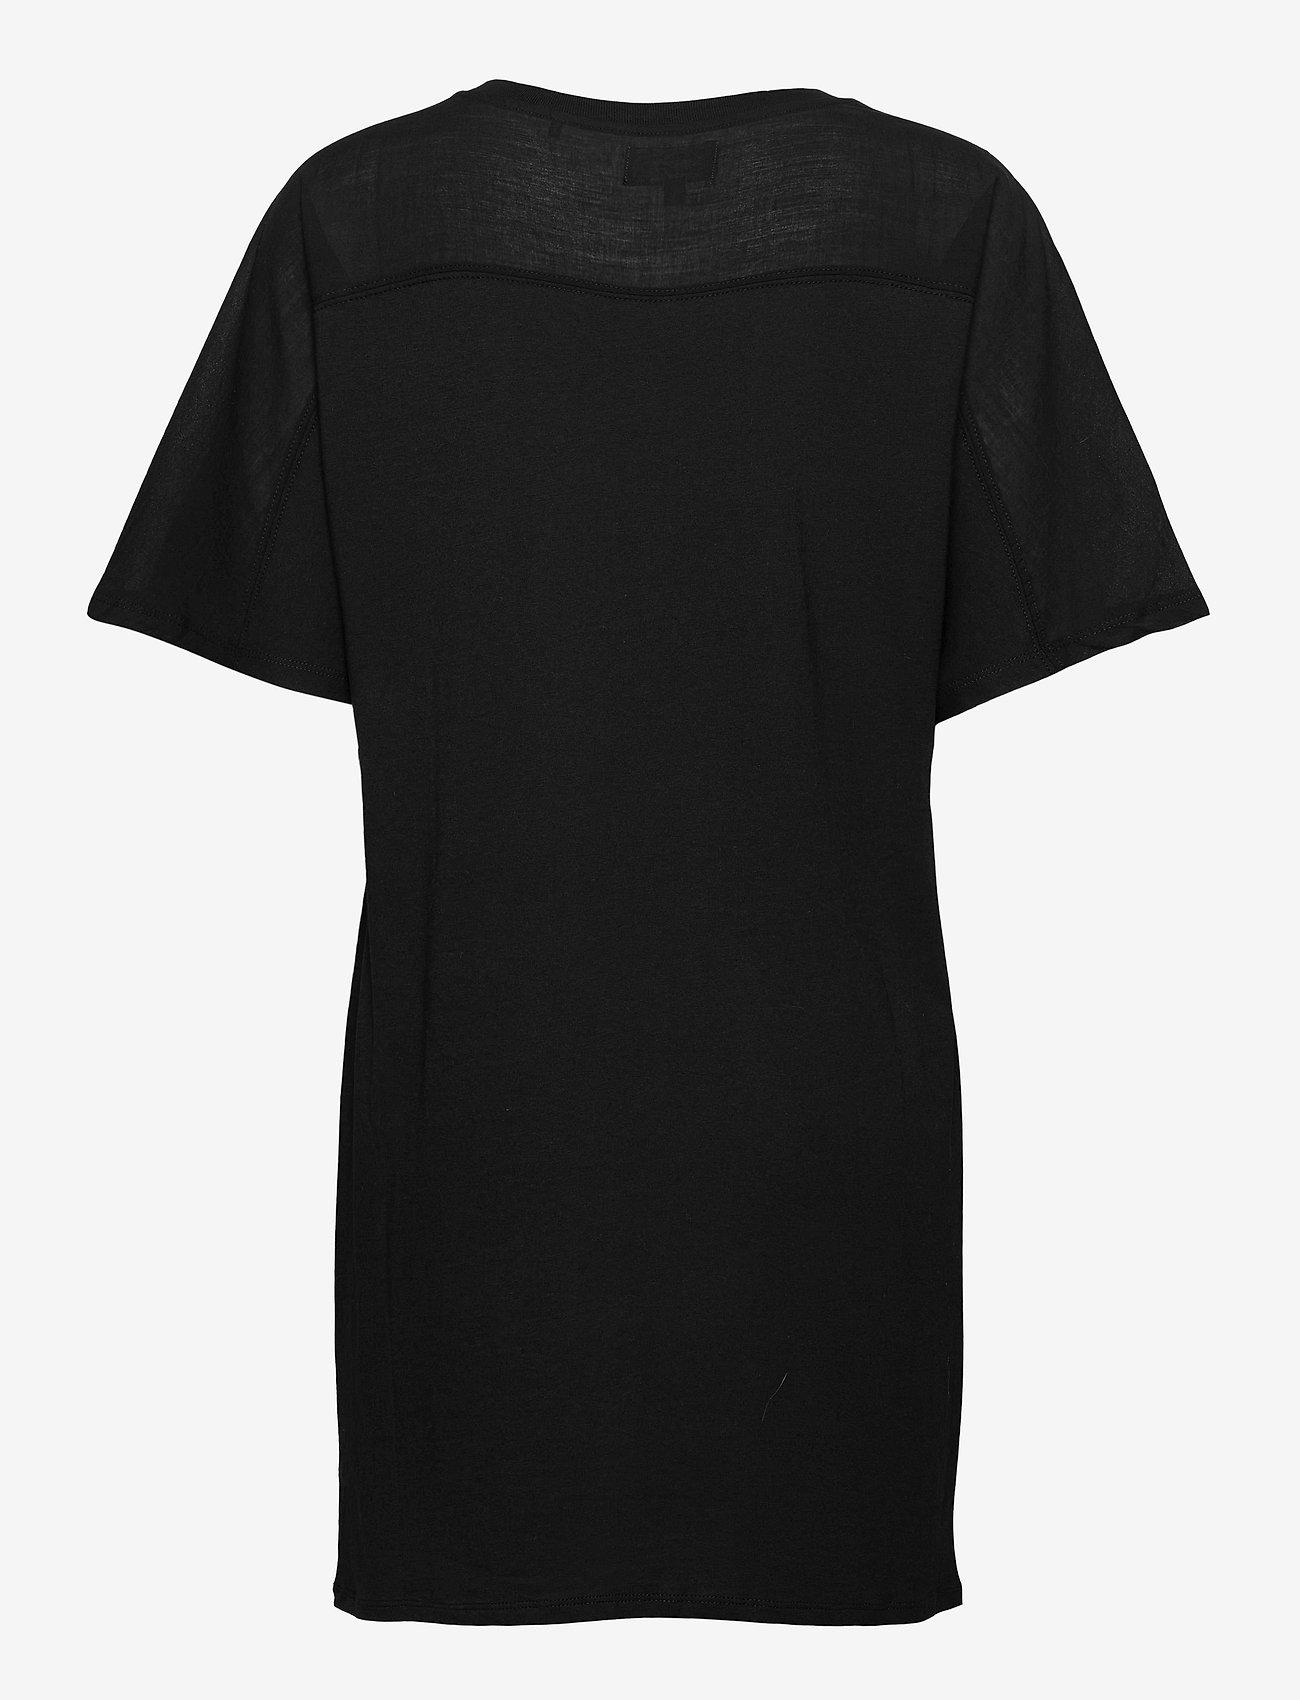 Superdry - COTTON MODAL TSHIRT DRESS - summer dresses - black - 1